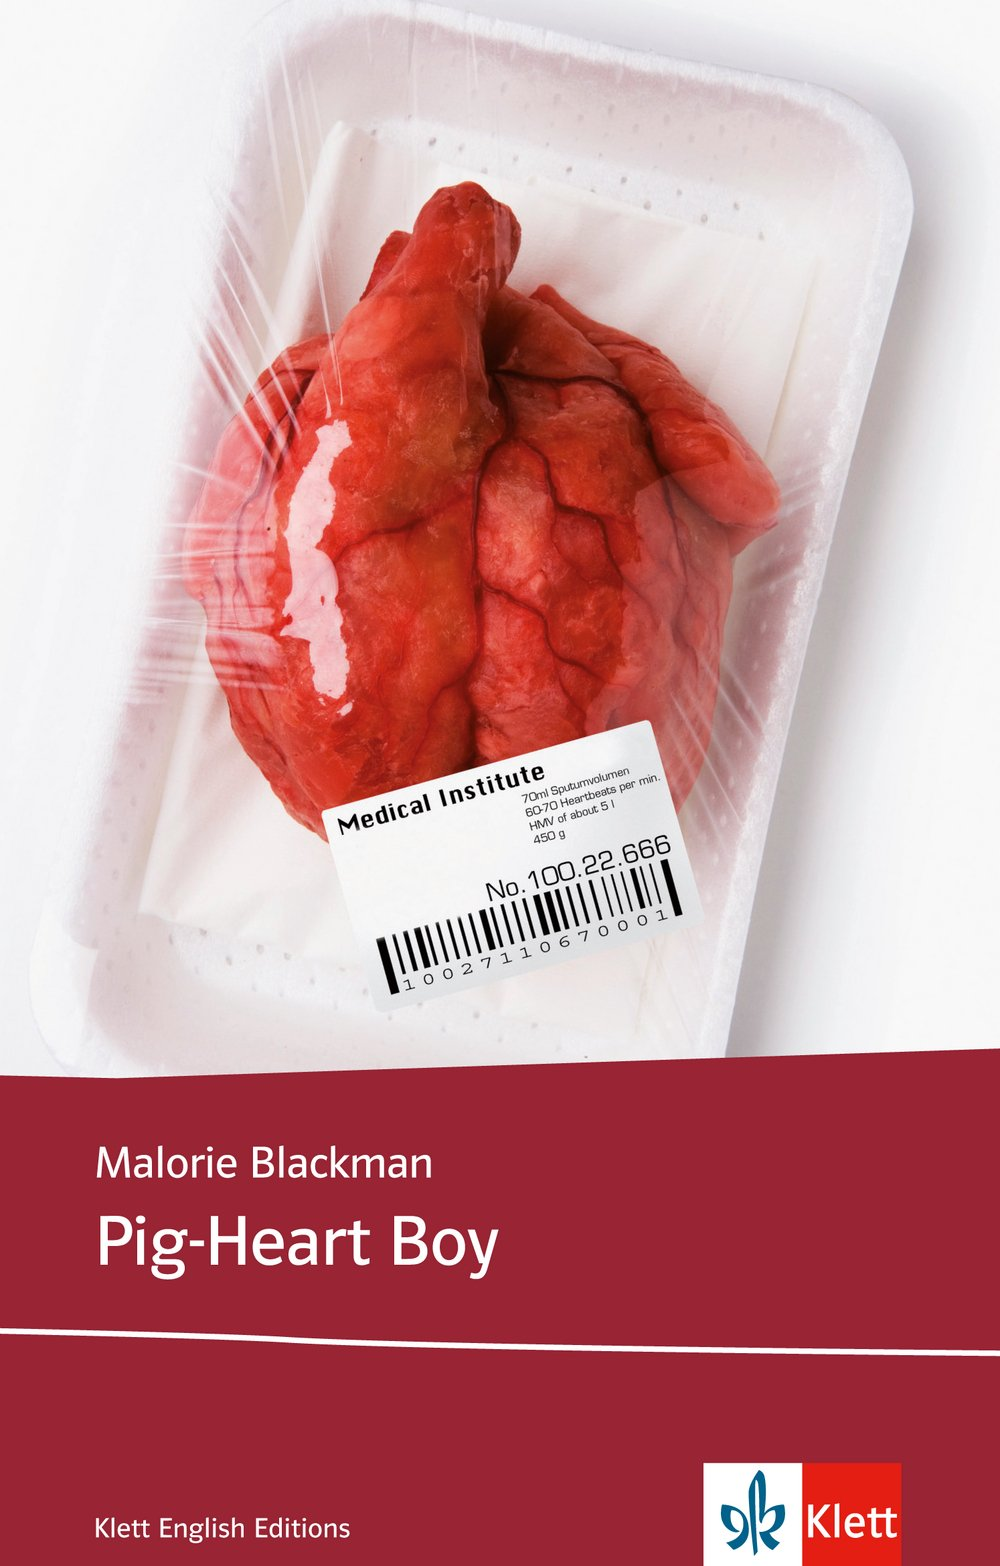 Pig Heart Boy Press Reviews